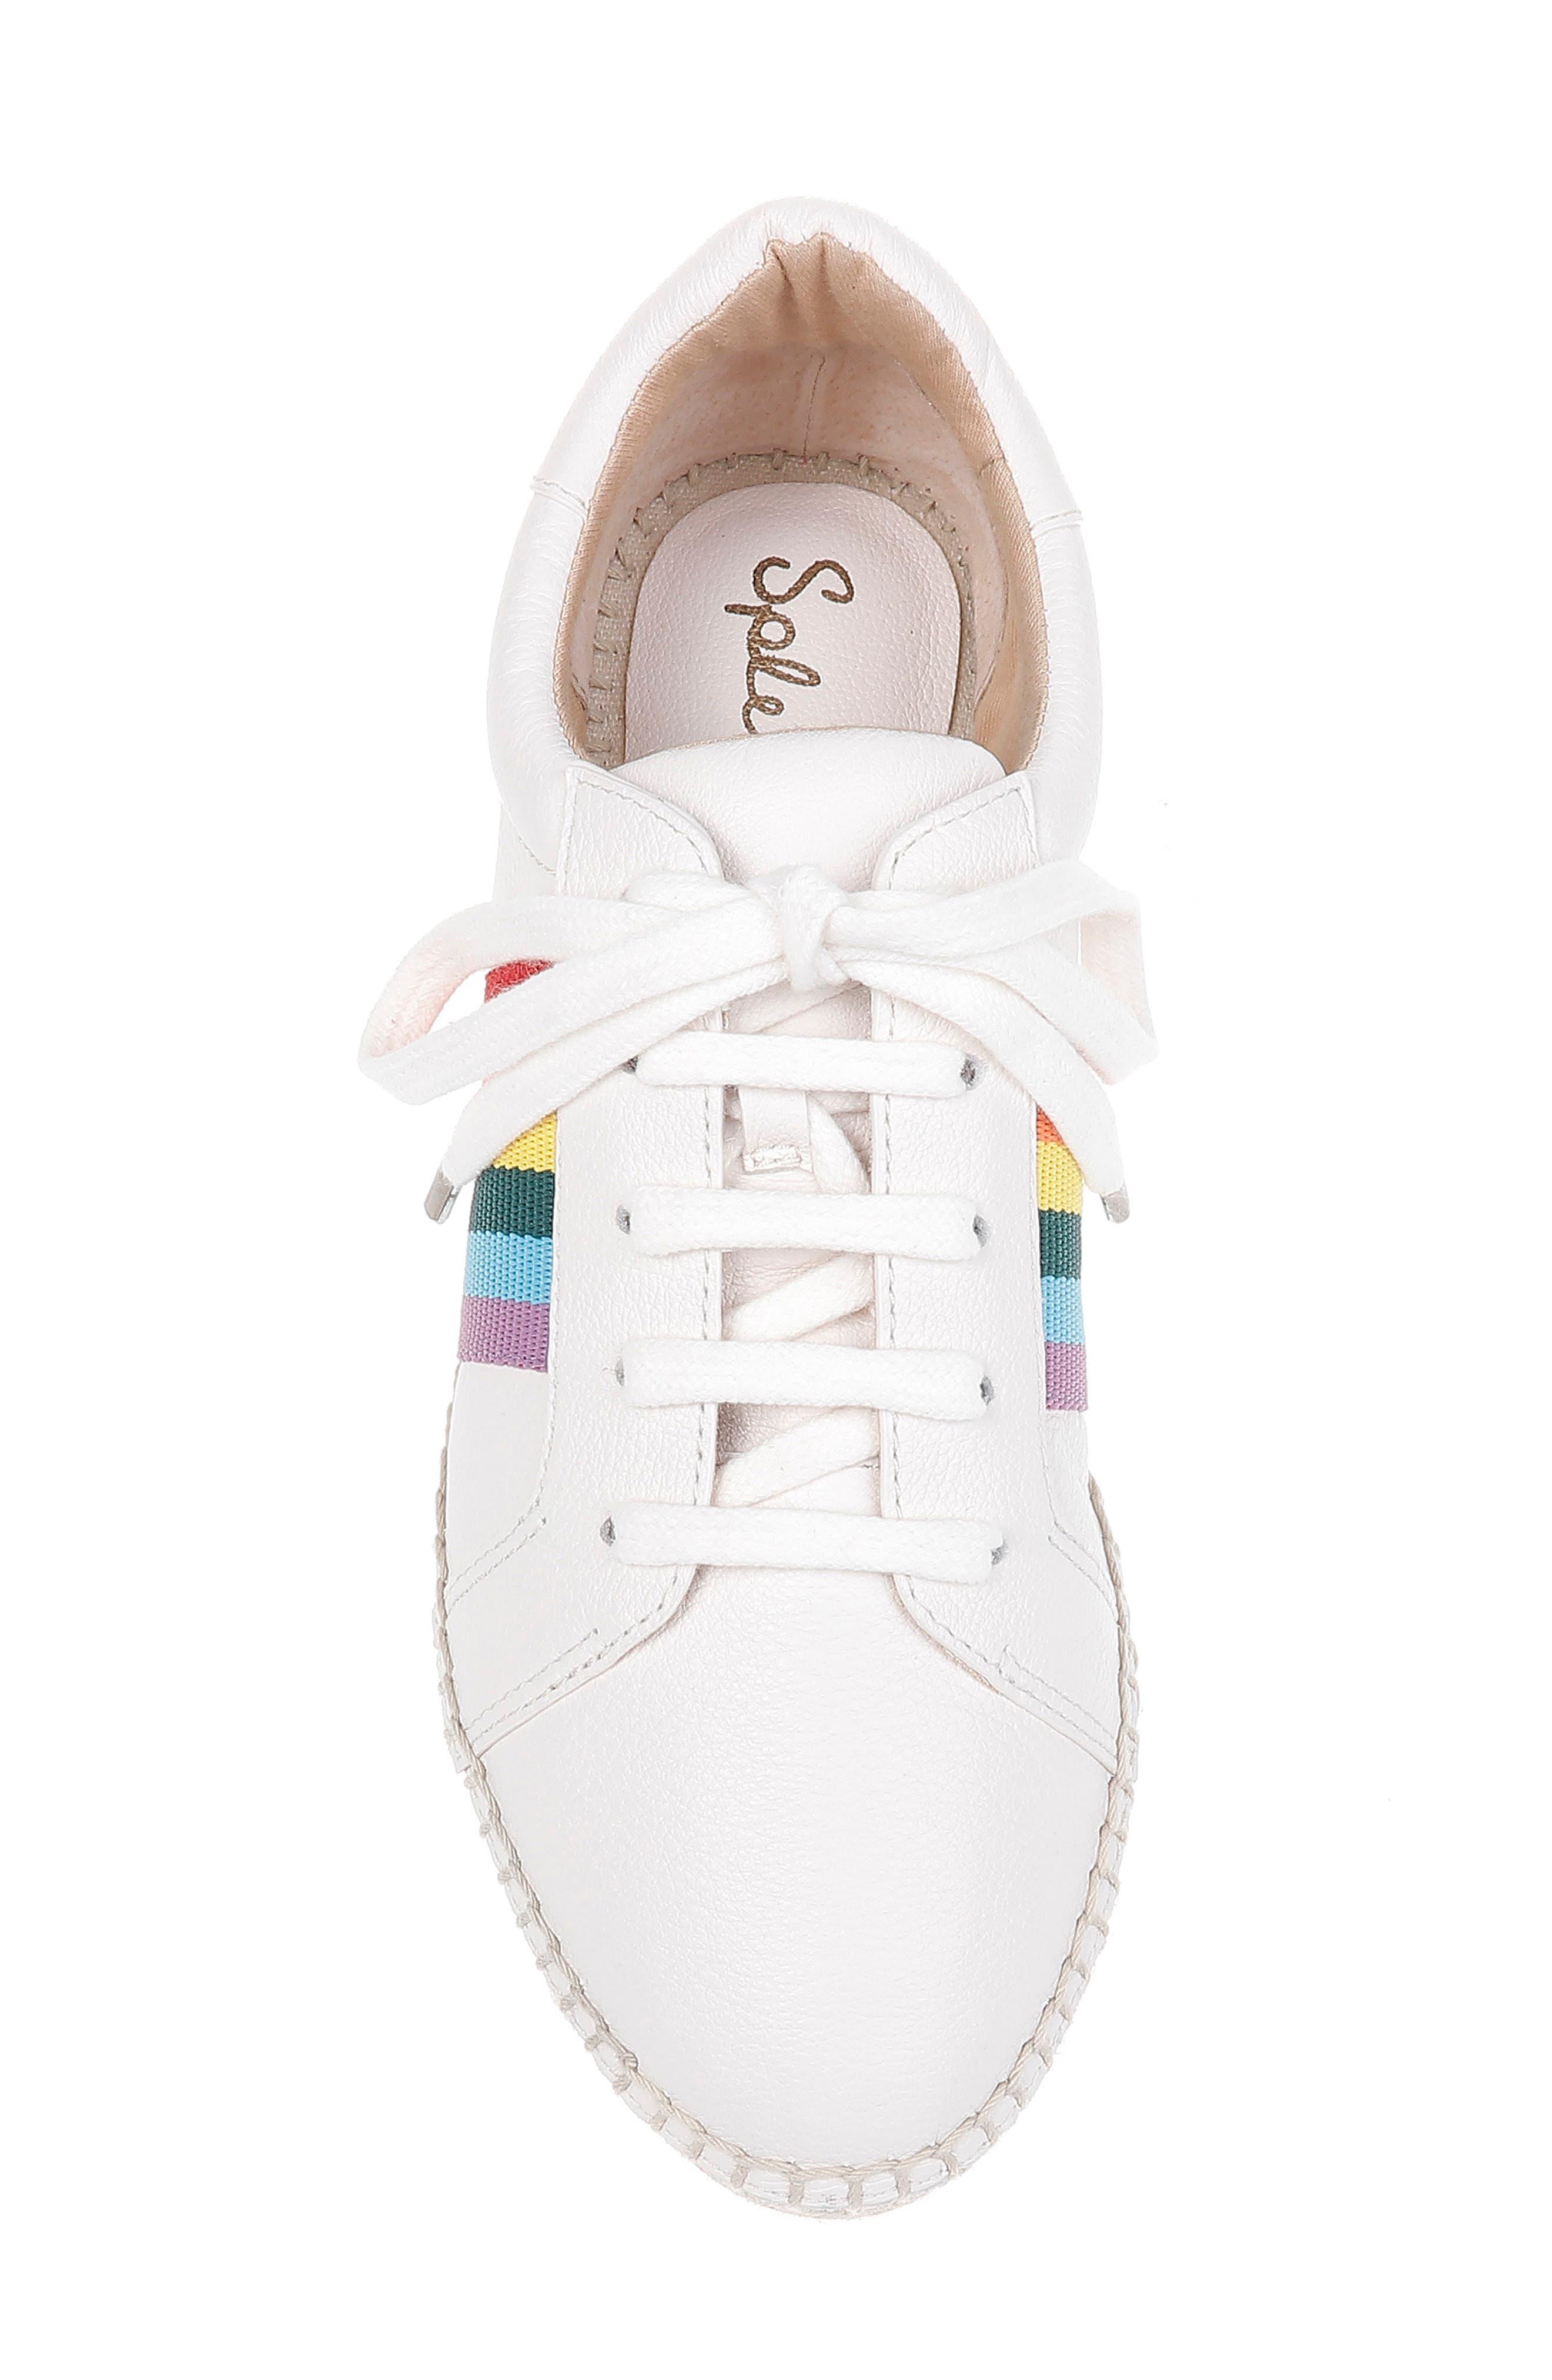 SPLENDID, Sada Espadrille Sneaker, Alternate thumbnail 5, color, OFF WHITE LEATHER